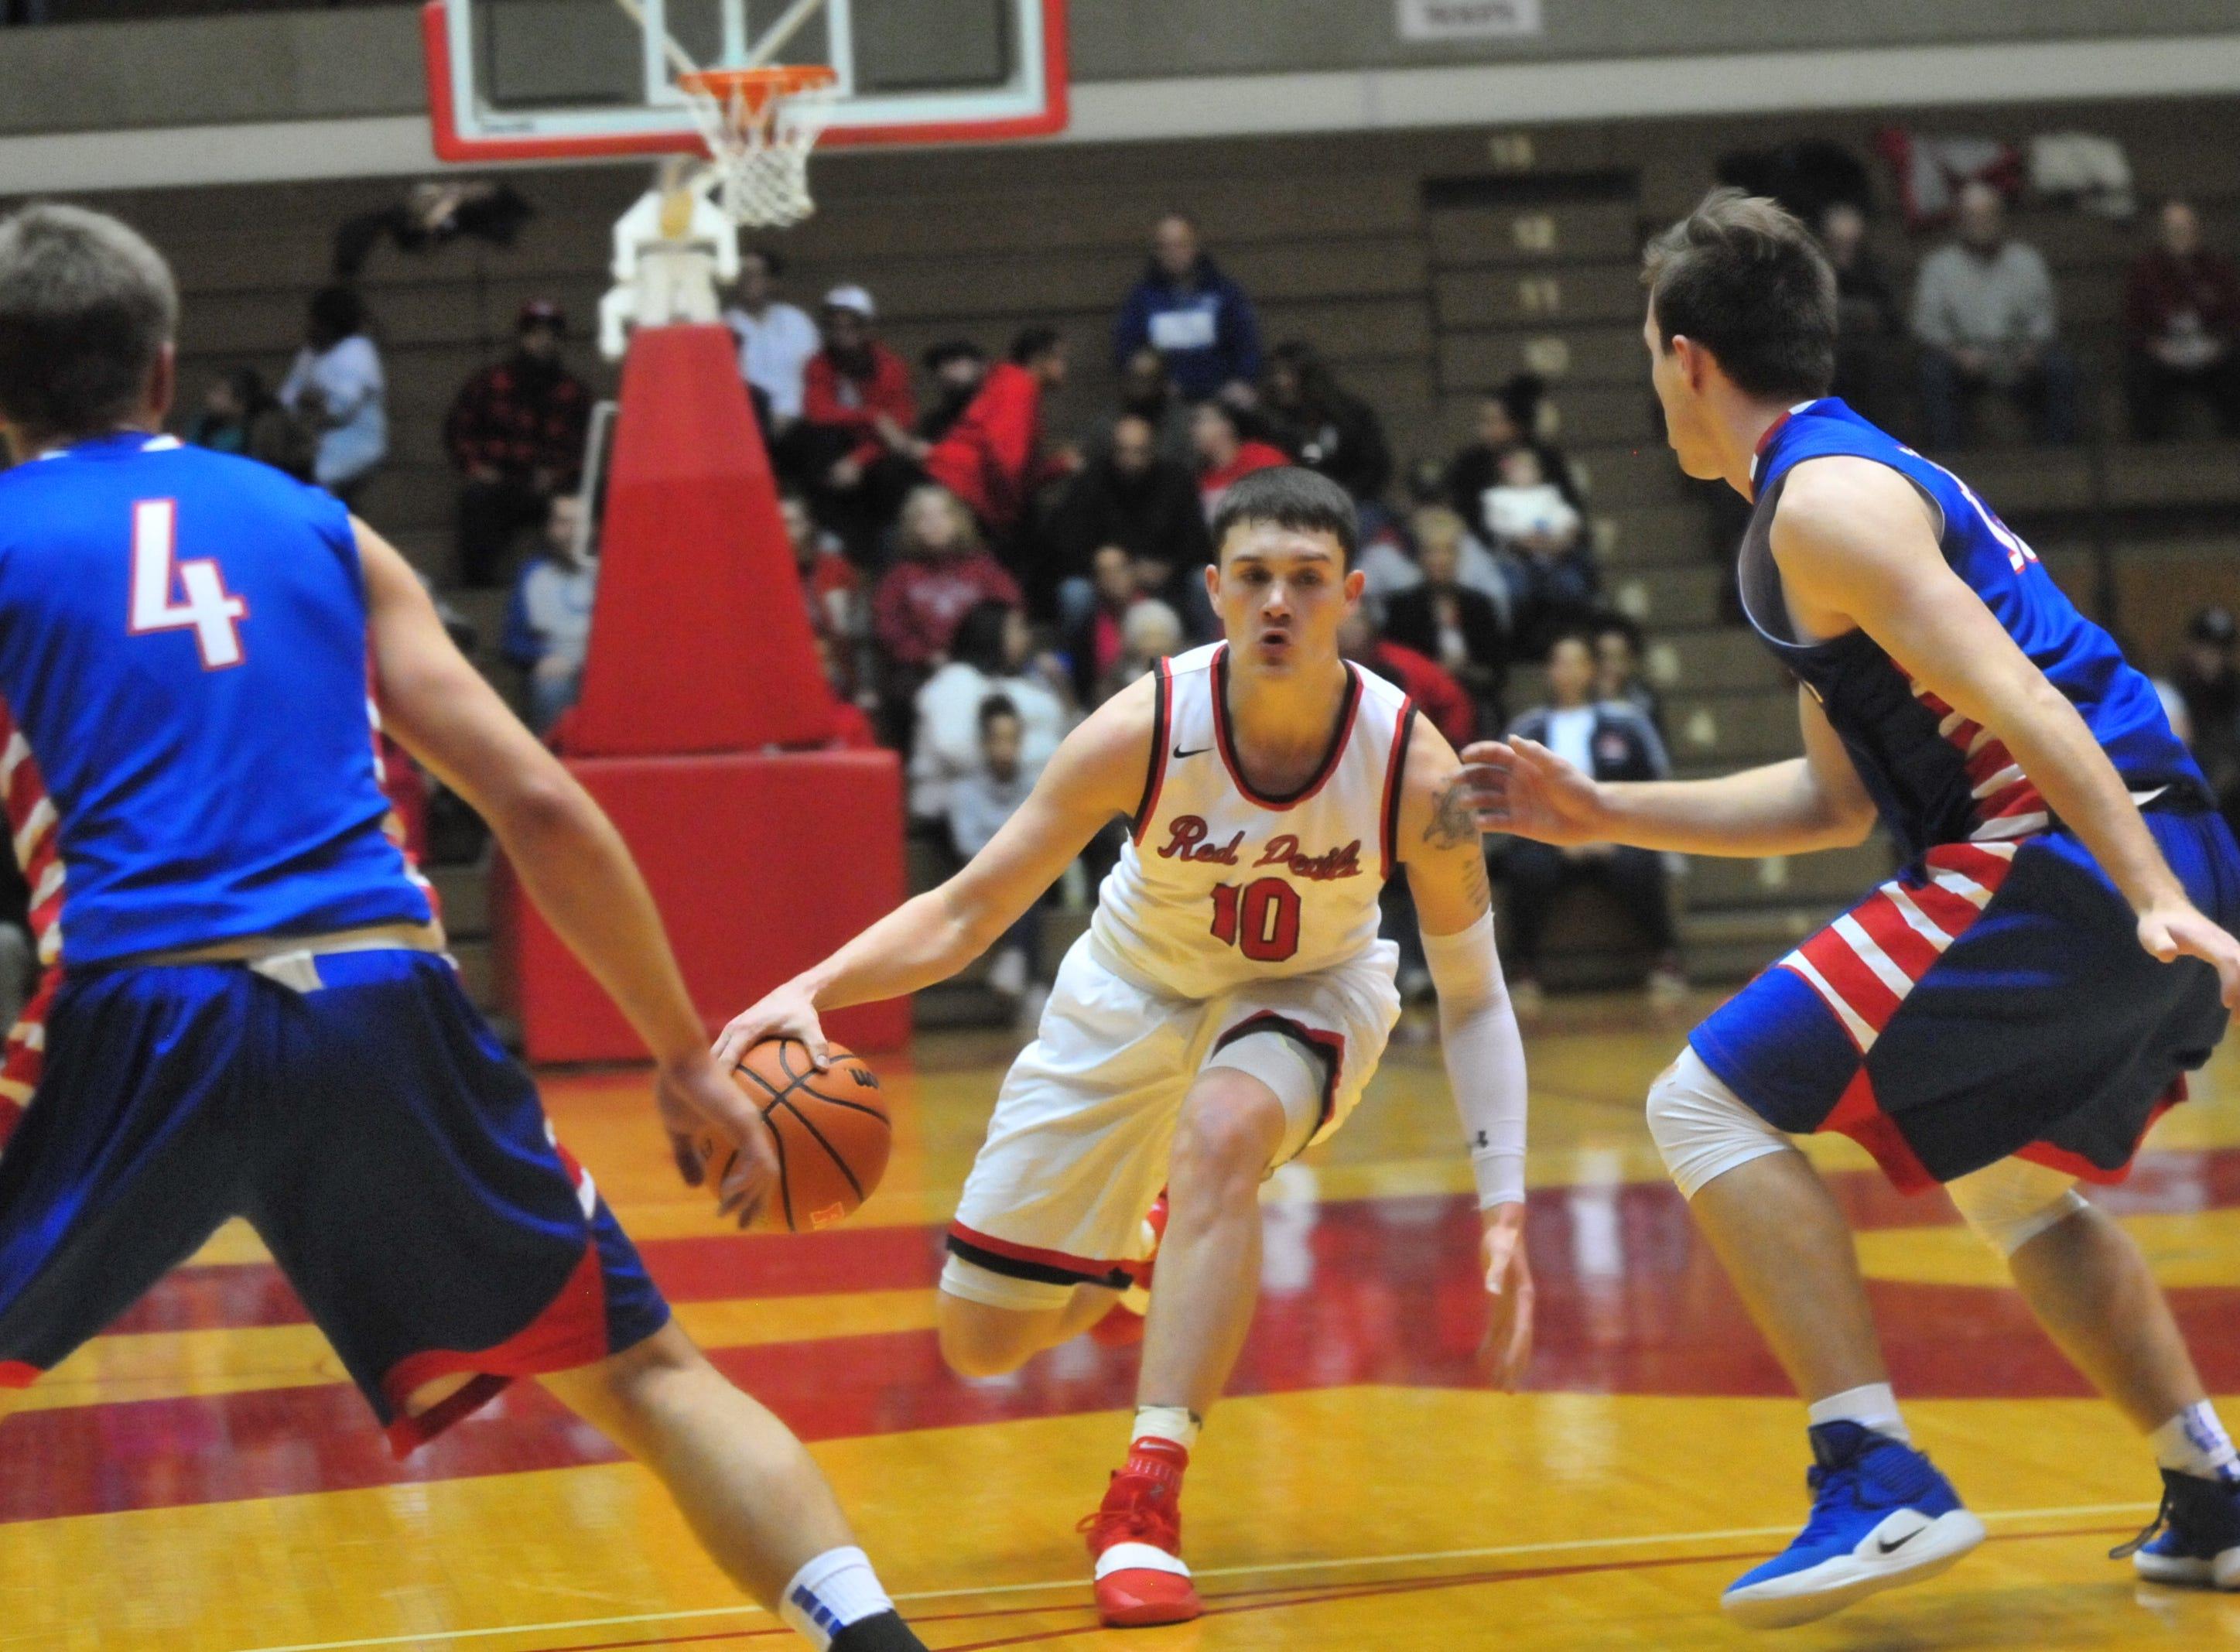 Richmond High School senior Lucas Kroft (10) moves the ball during a boys basketball game against Jay County Saturday, Nov. 24, 2018 at Richmond High School's Tiernan Center.